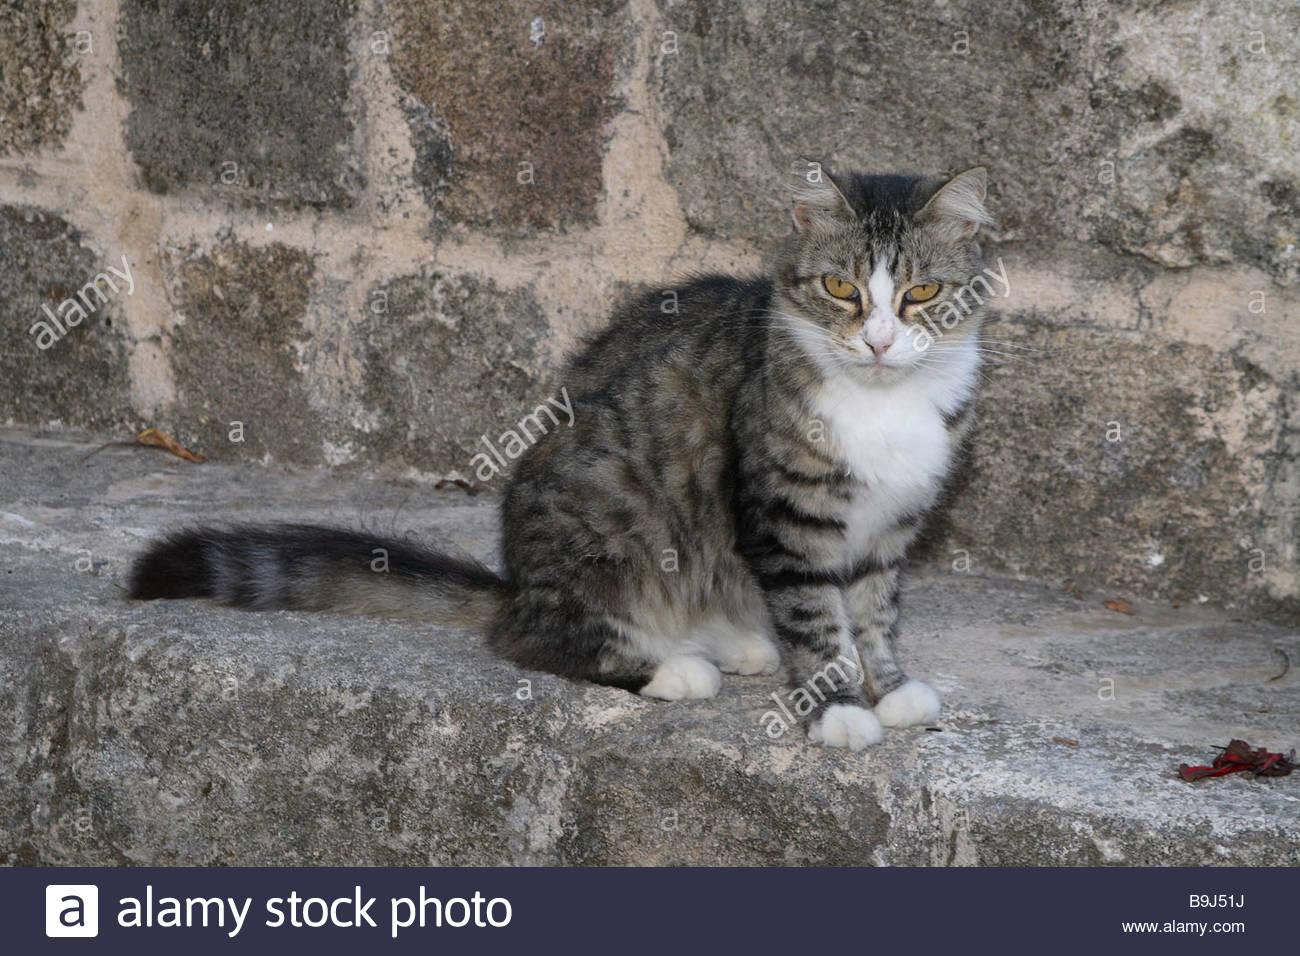 Animal Liver Stockfotos & Animal Liver Bilder - Alamy